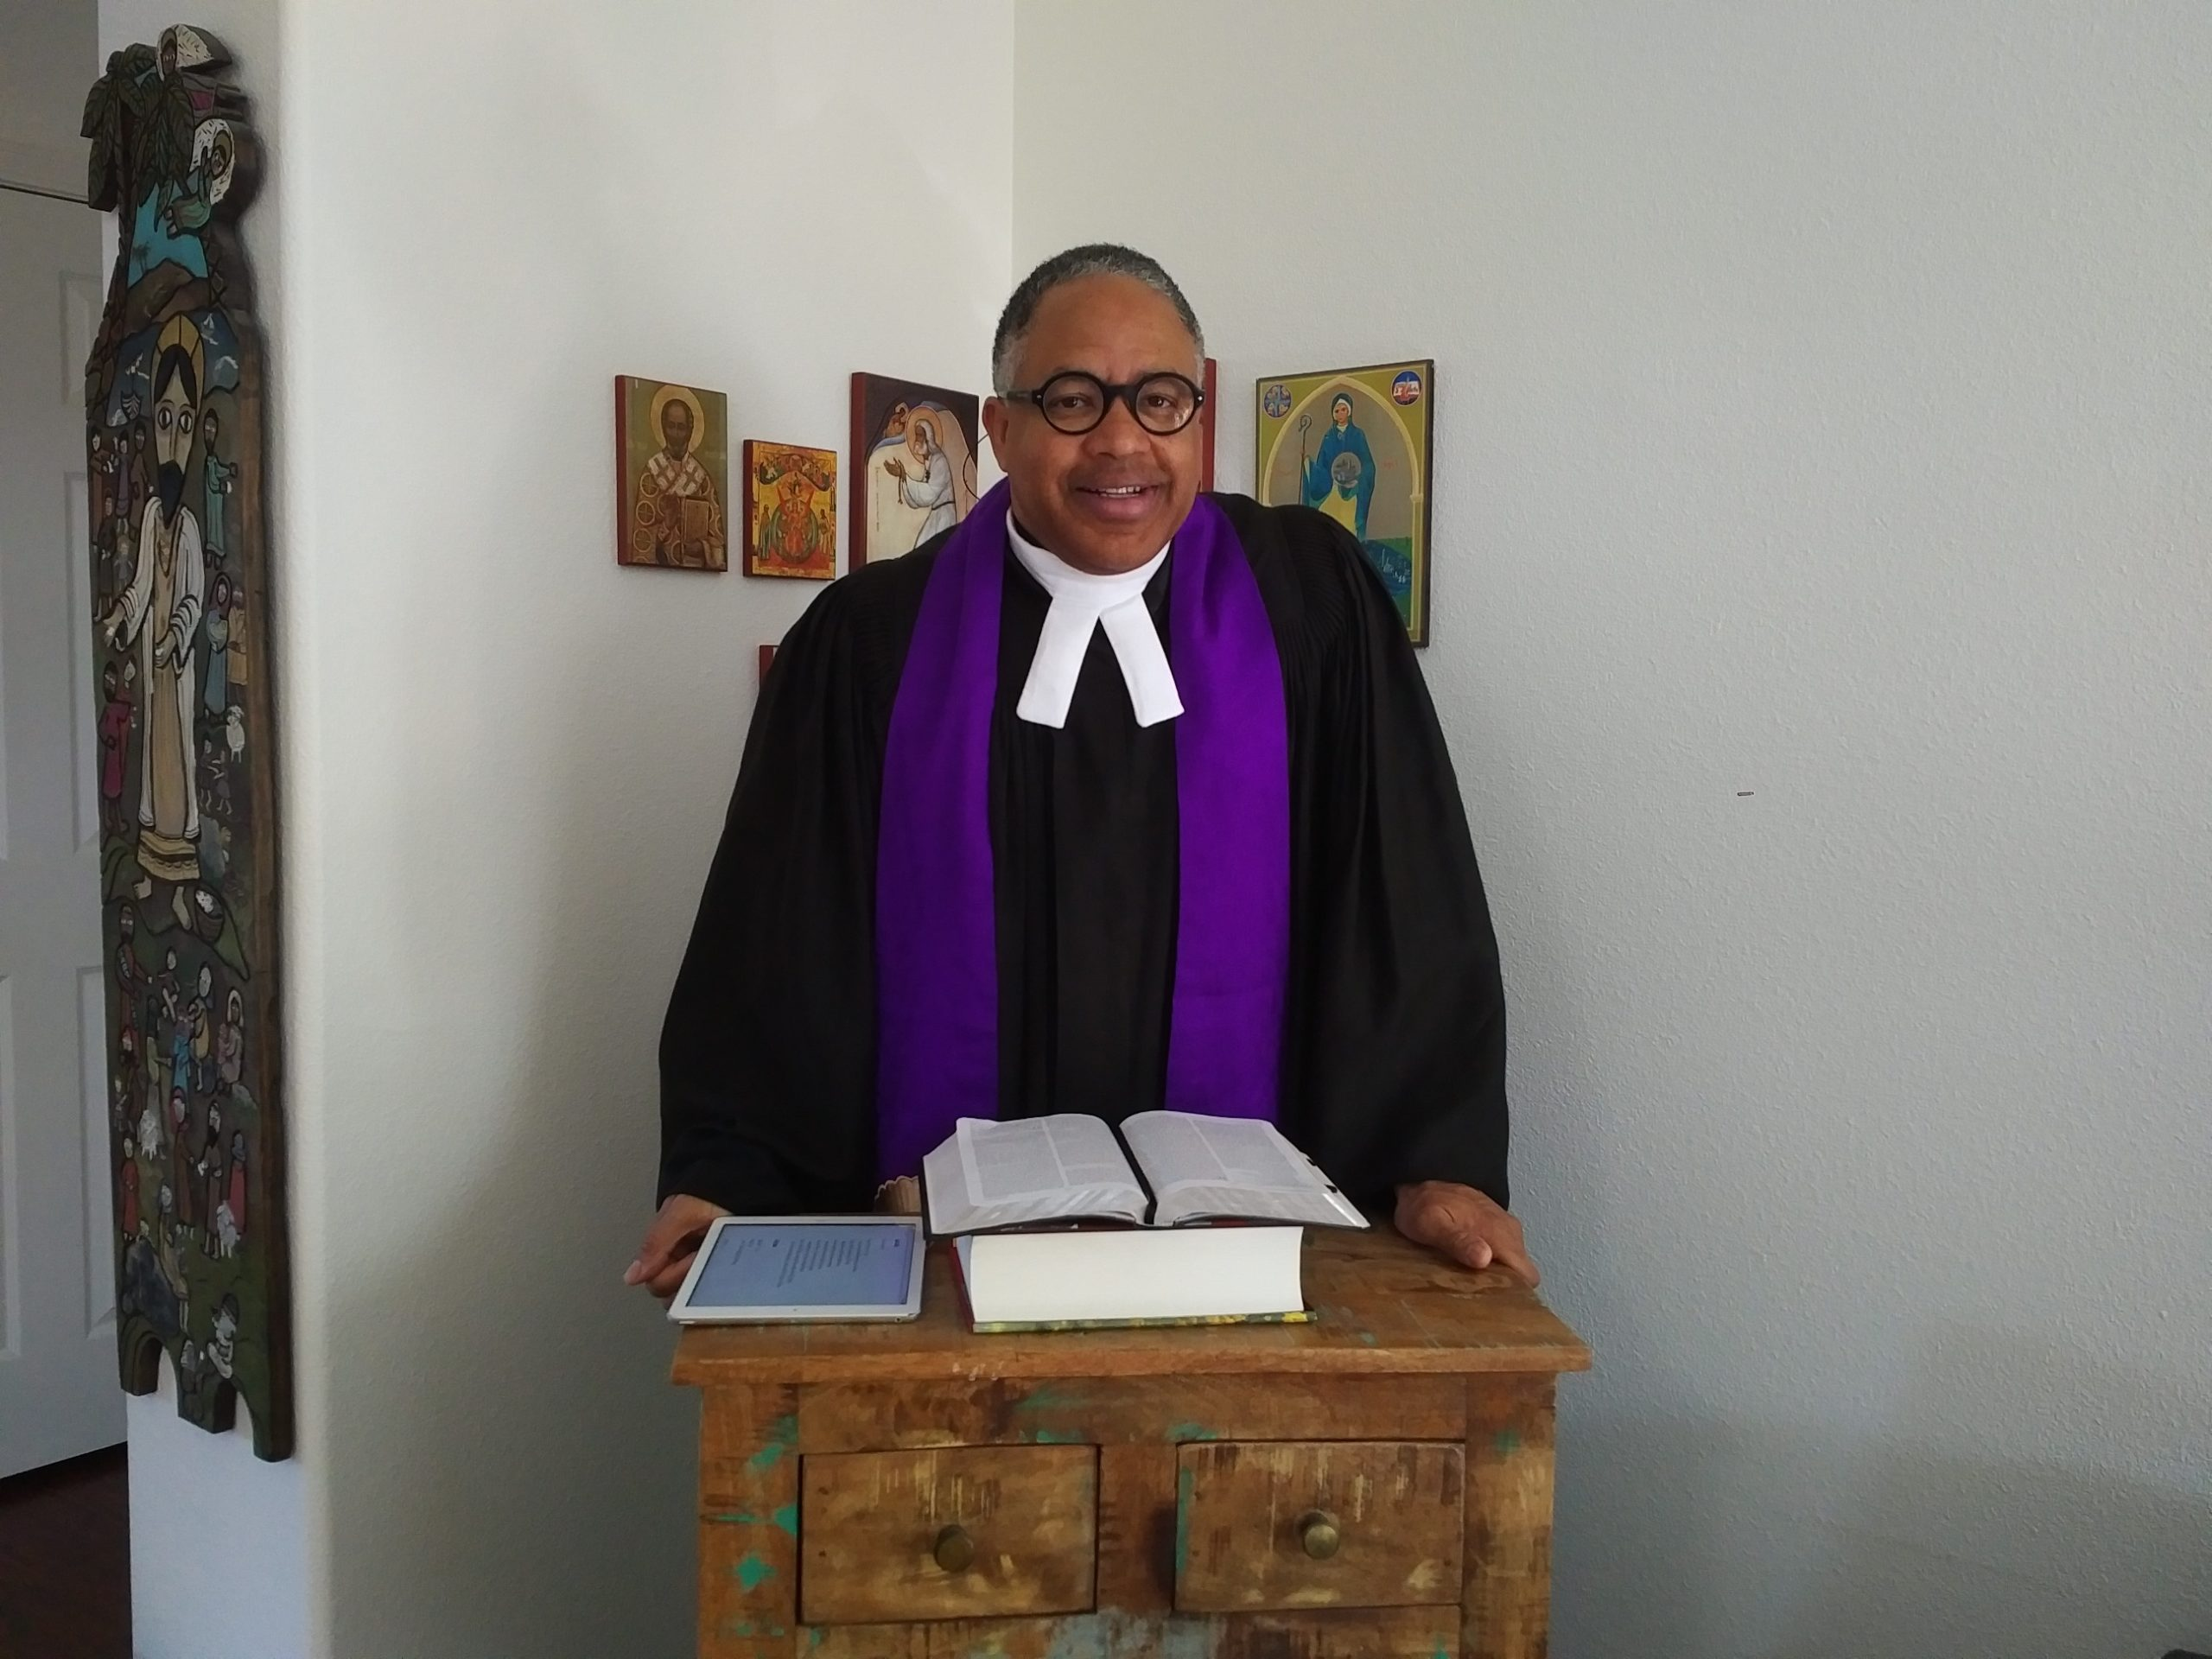 Pastor Nathan Byrd